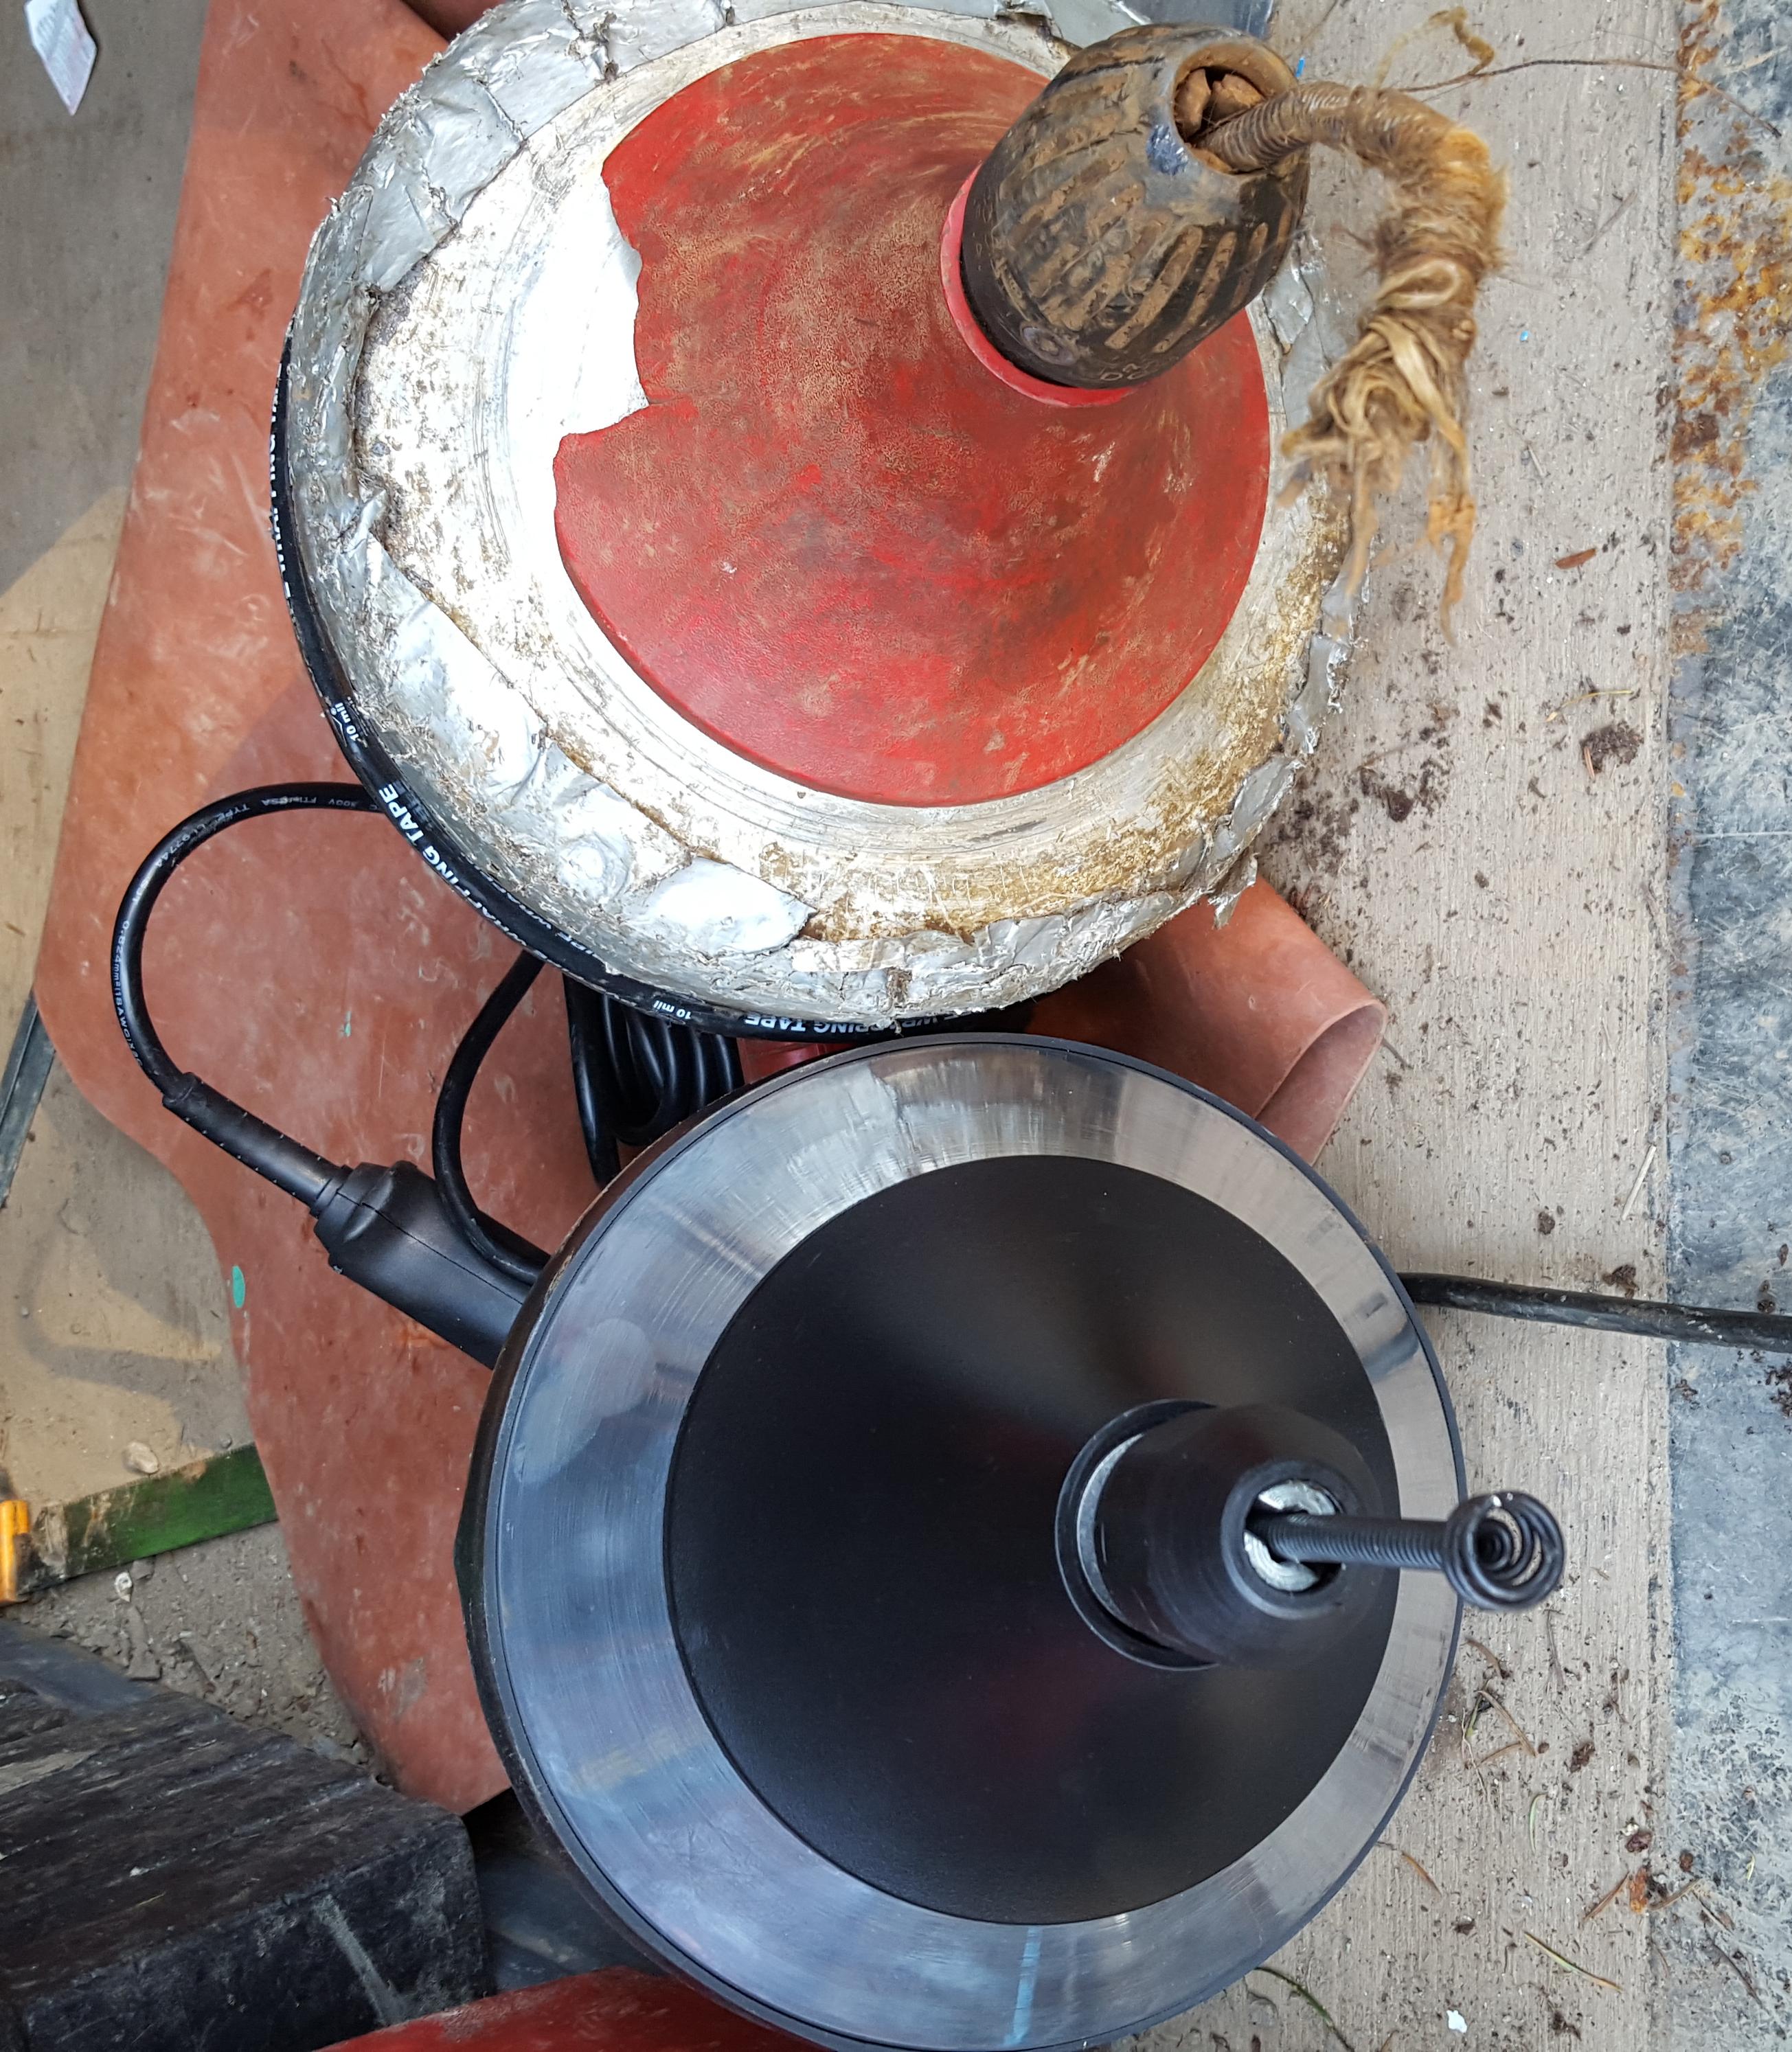 New sink snake Plumbing Zone Professional Plumbers Forum